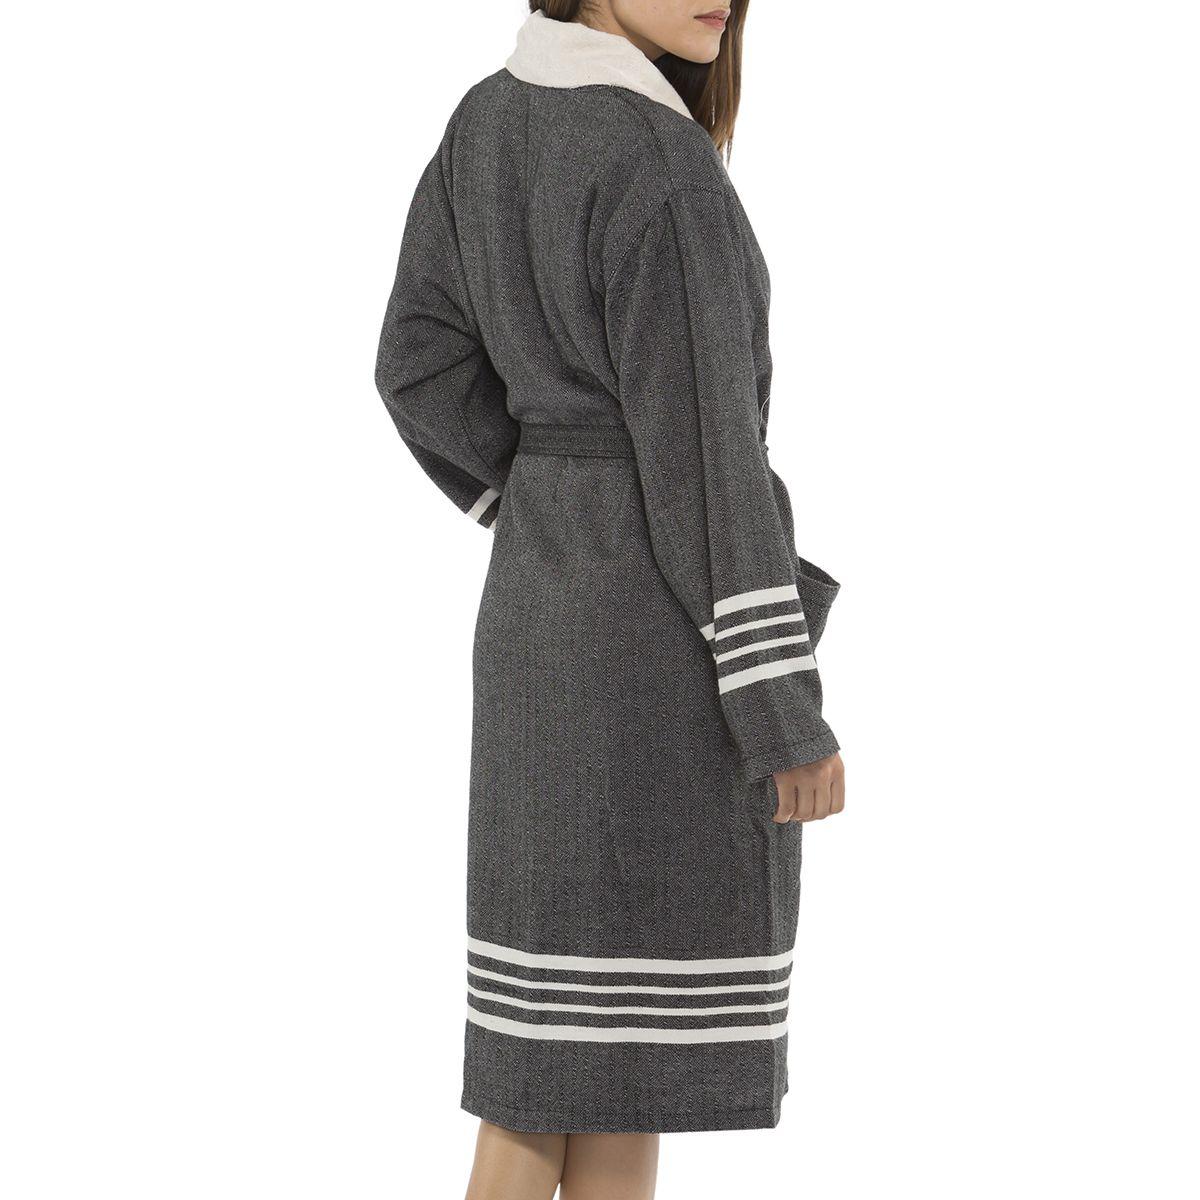 Bathrobe Sultan with towel - Black